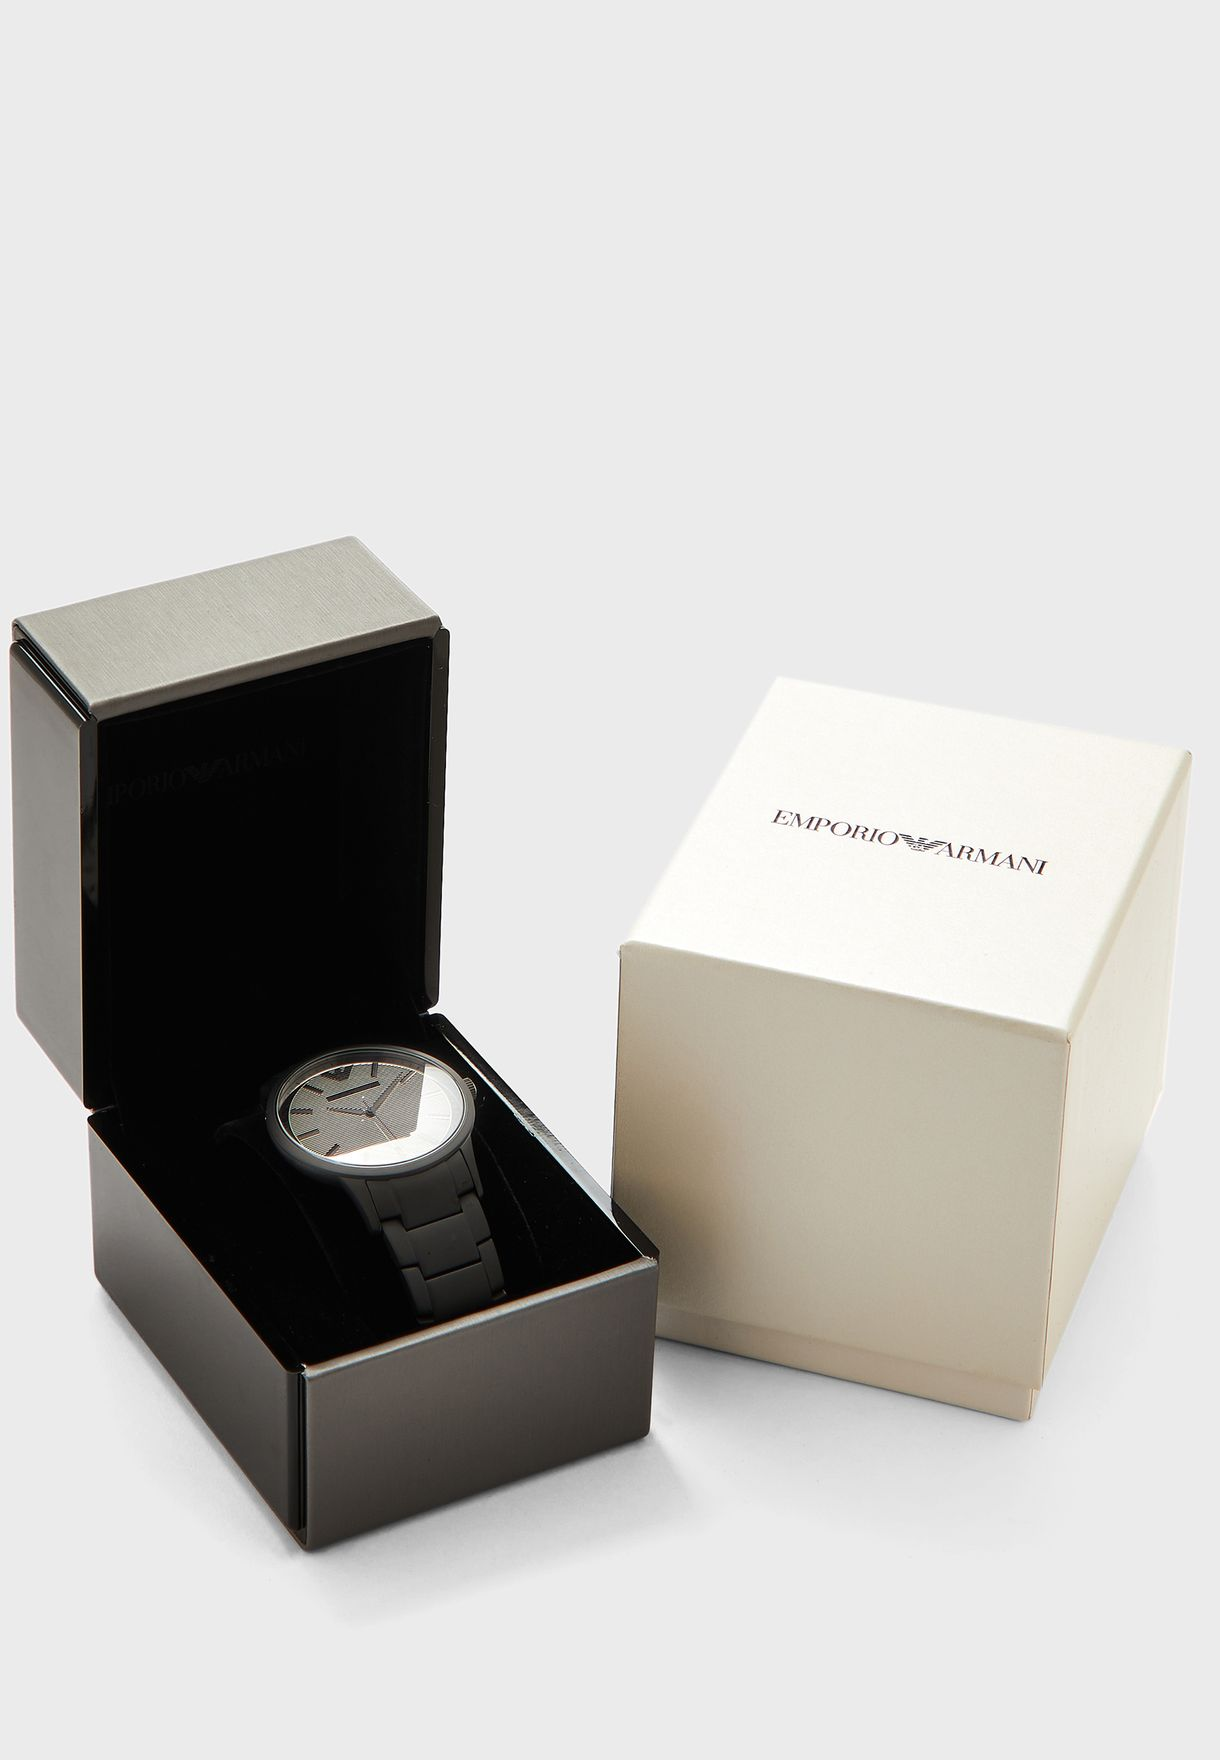 AR11259 Leather Strap Analog Watch